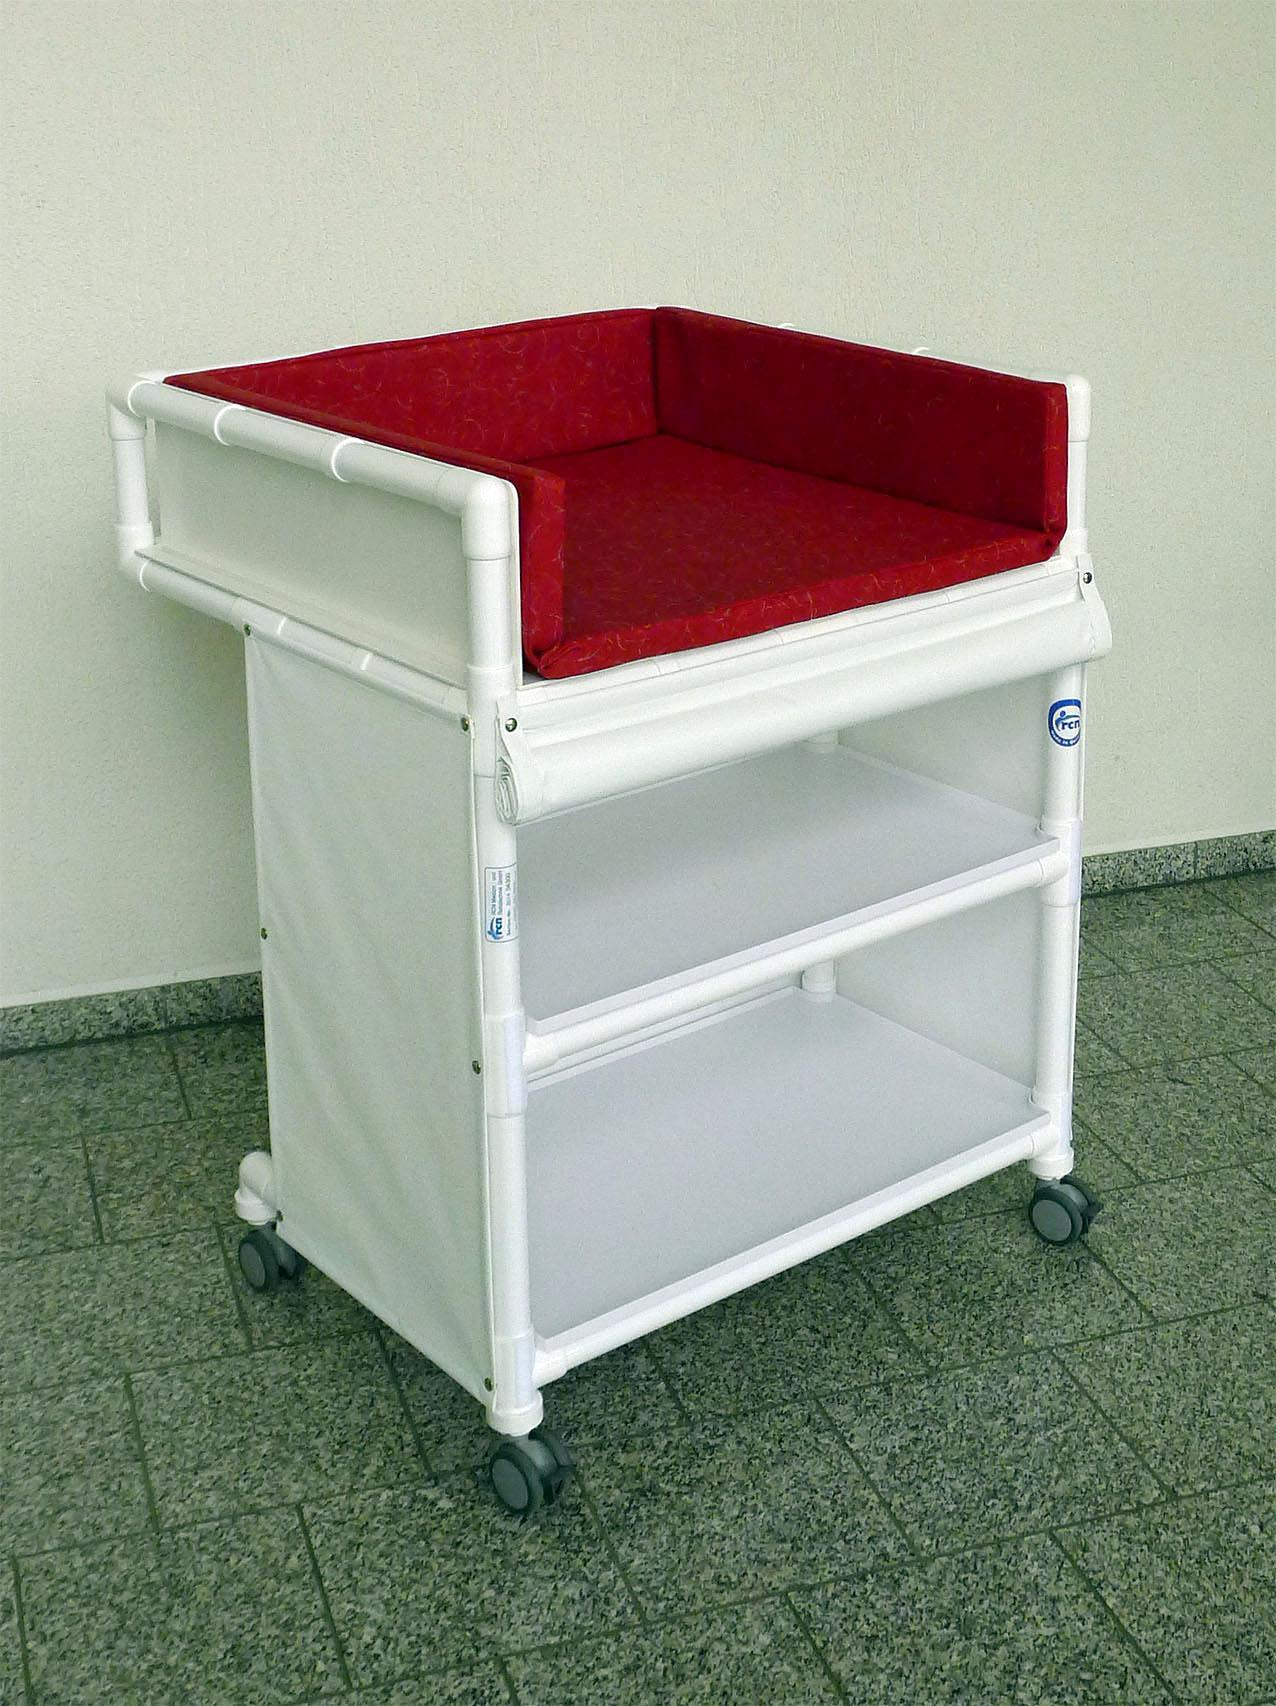 Klinik Wk5 Rollbare Wickelkommode Wickeltisch Rcn Kaufen Bei Www Hygienehilfen De